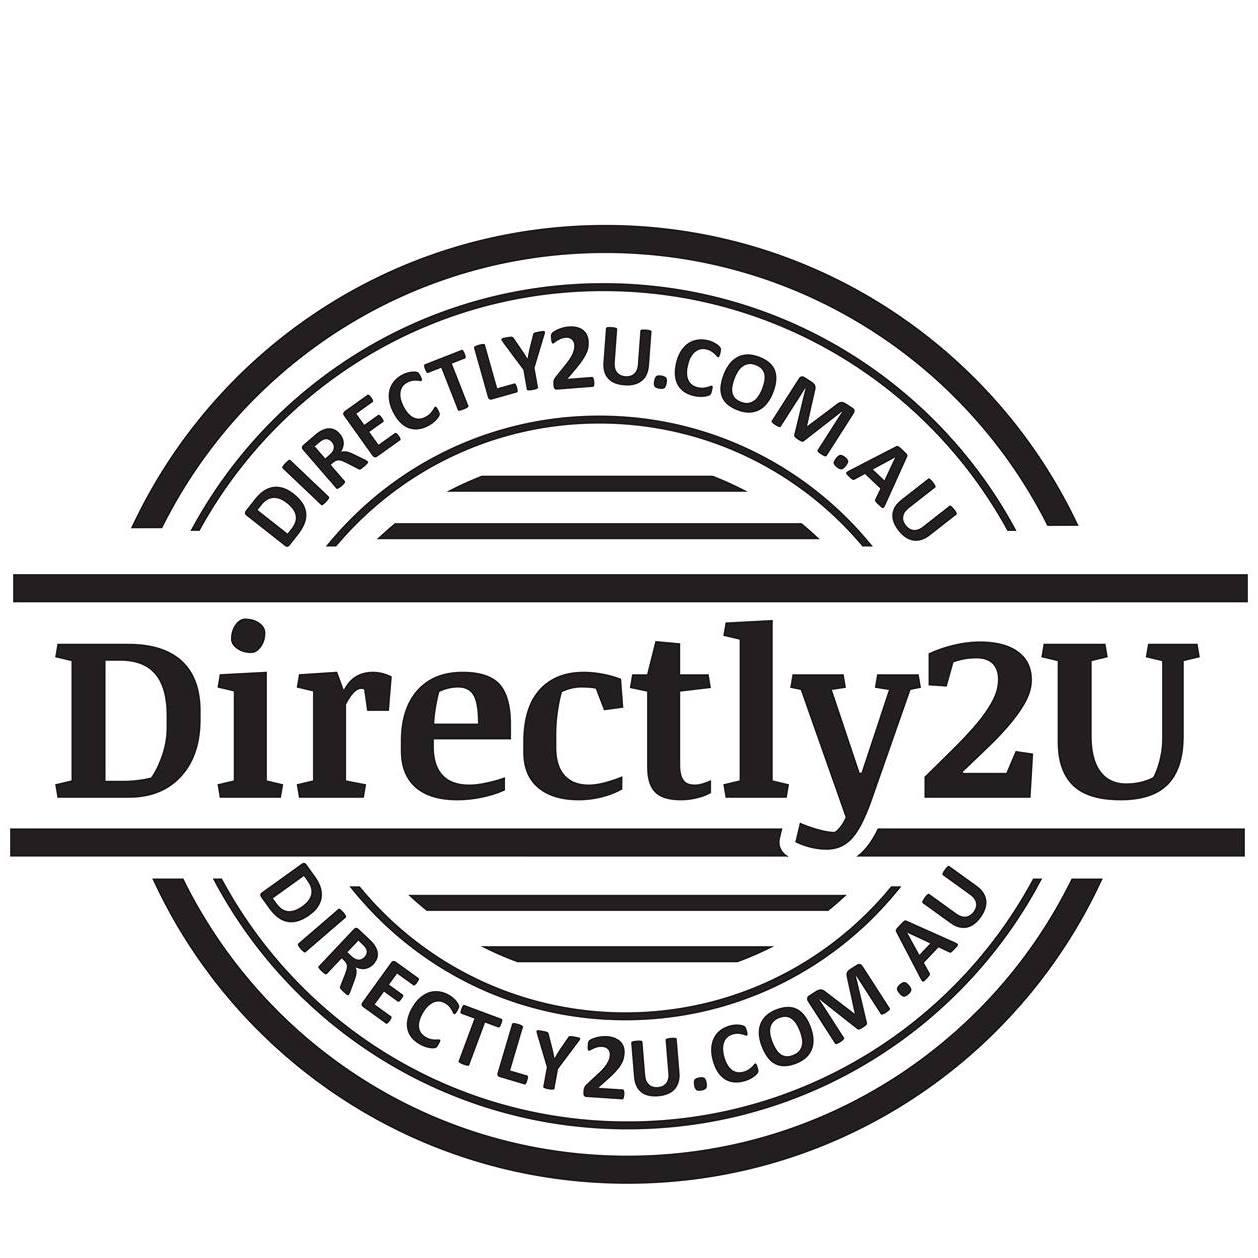 Directly2u